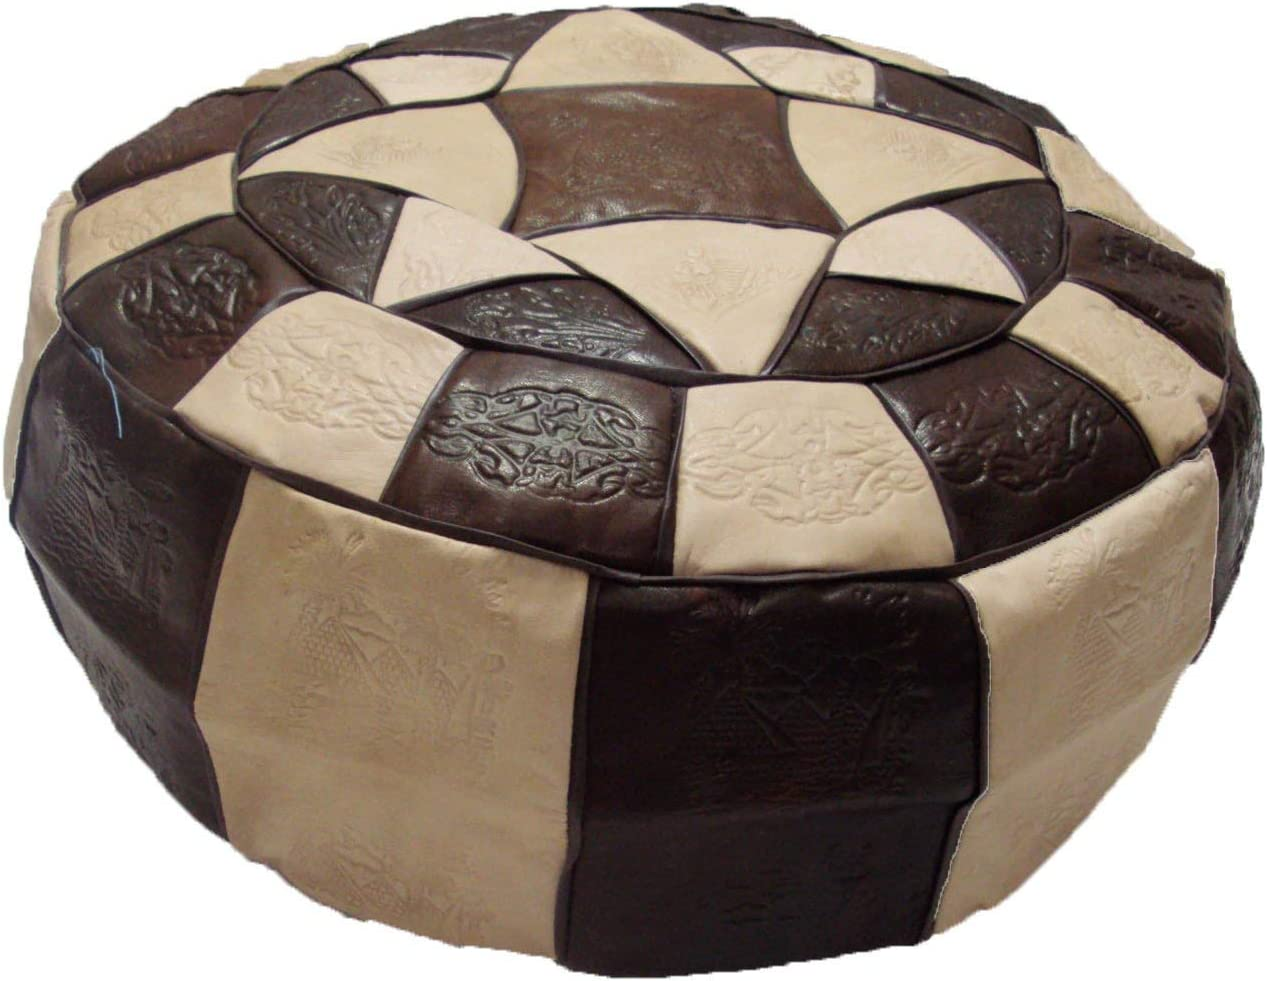 Authentic Egyptian Morocan Handmade Genuine Leather Ottoman Pouf Footstool Unstuffed XLarge Diameter 20 Height 11.3